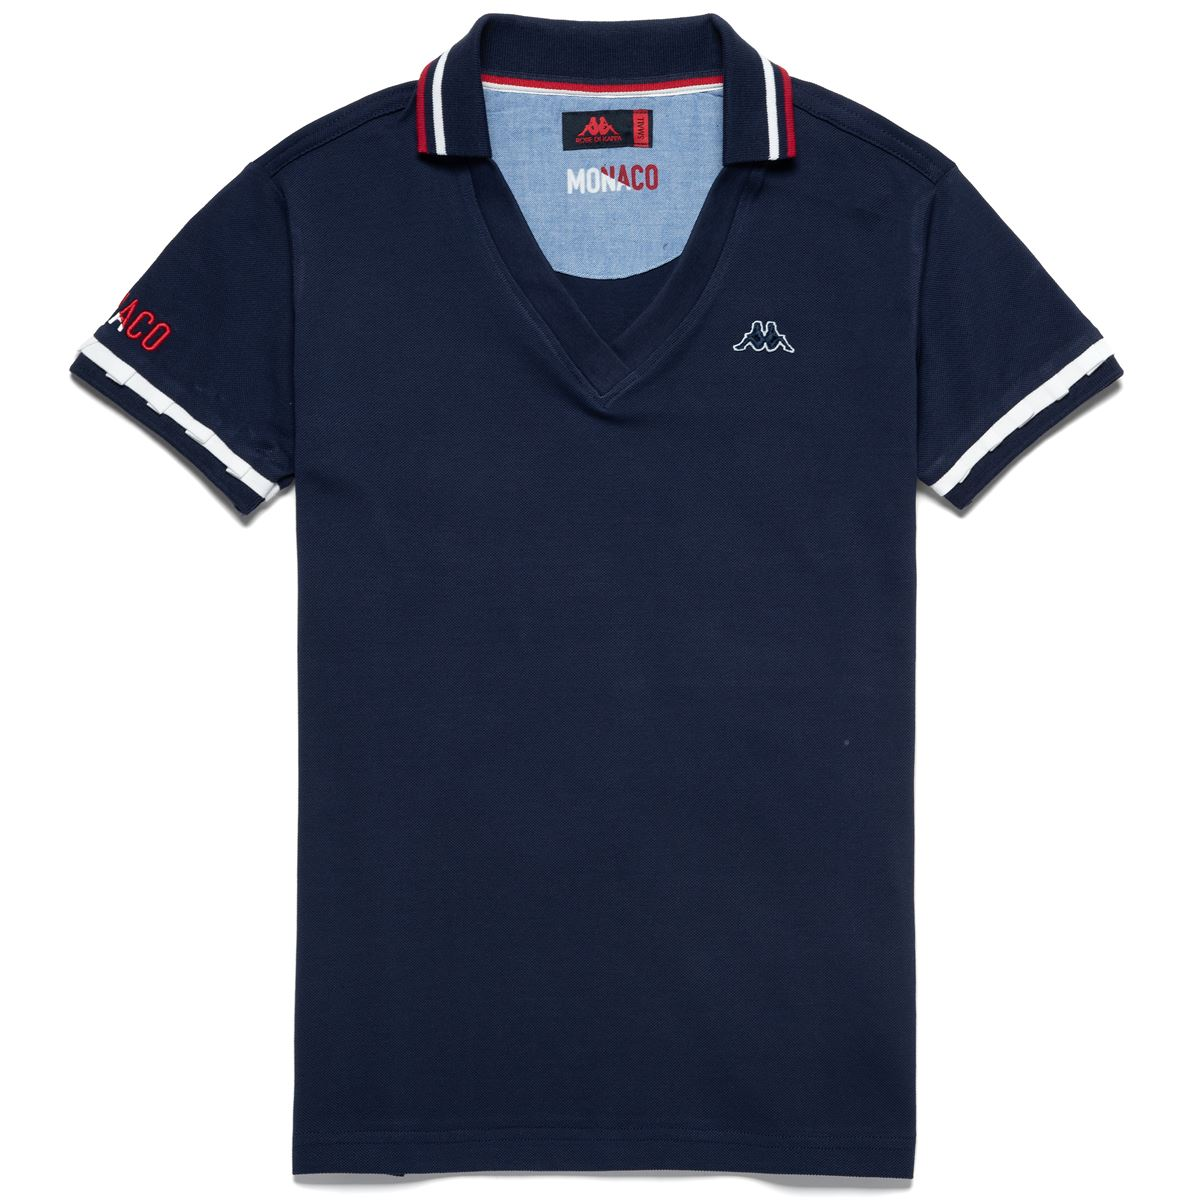 Robe di Kappa Polo Shirts donna-611283WASM